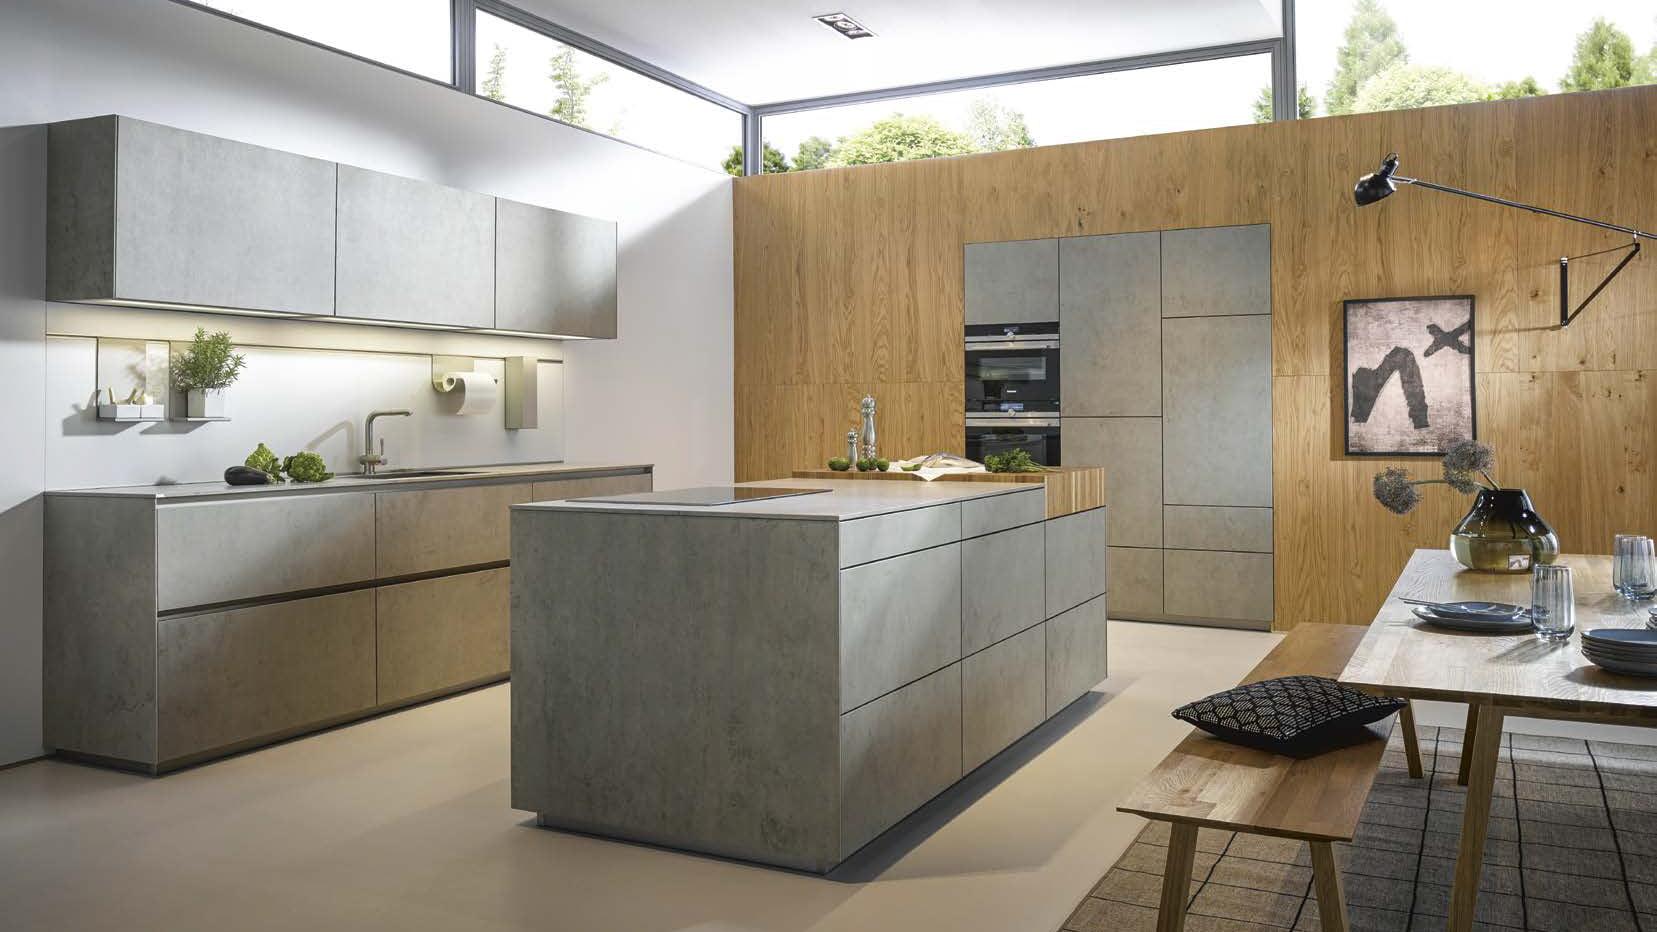 NX 950 Ceramic concrete grey